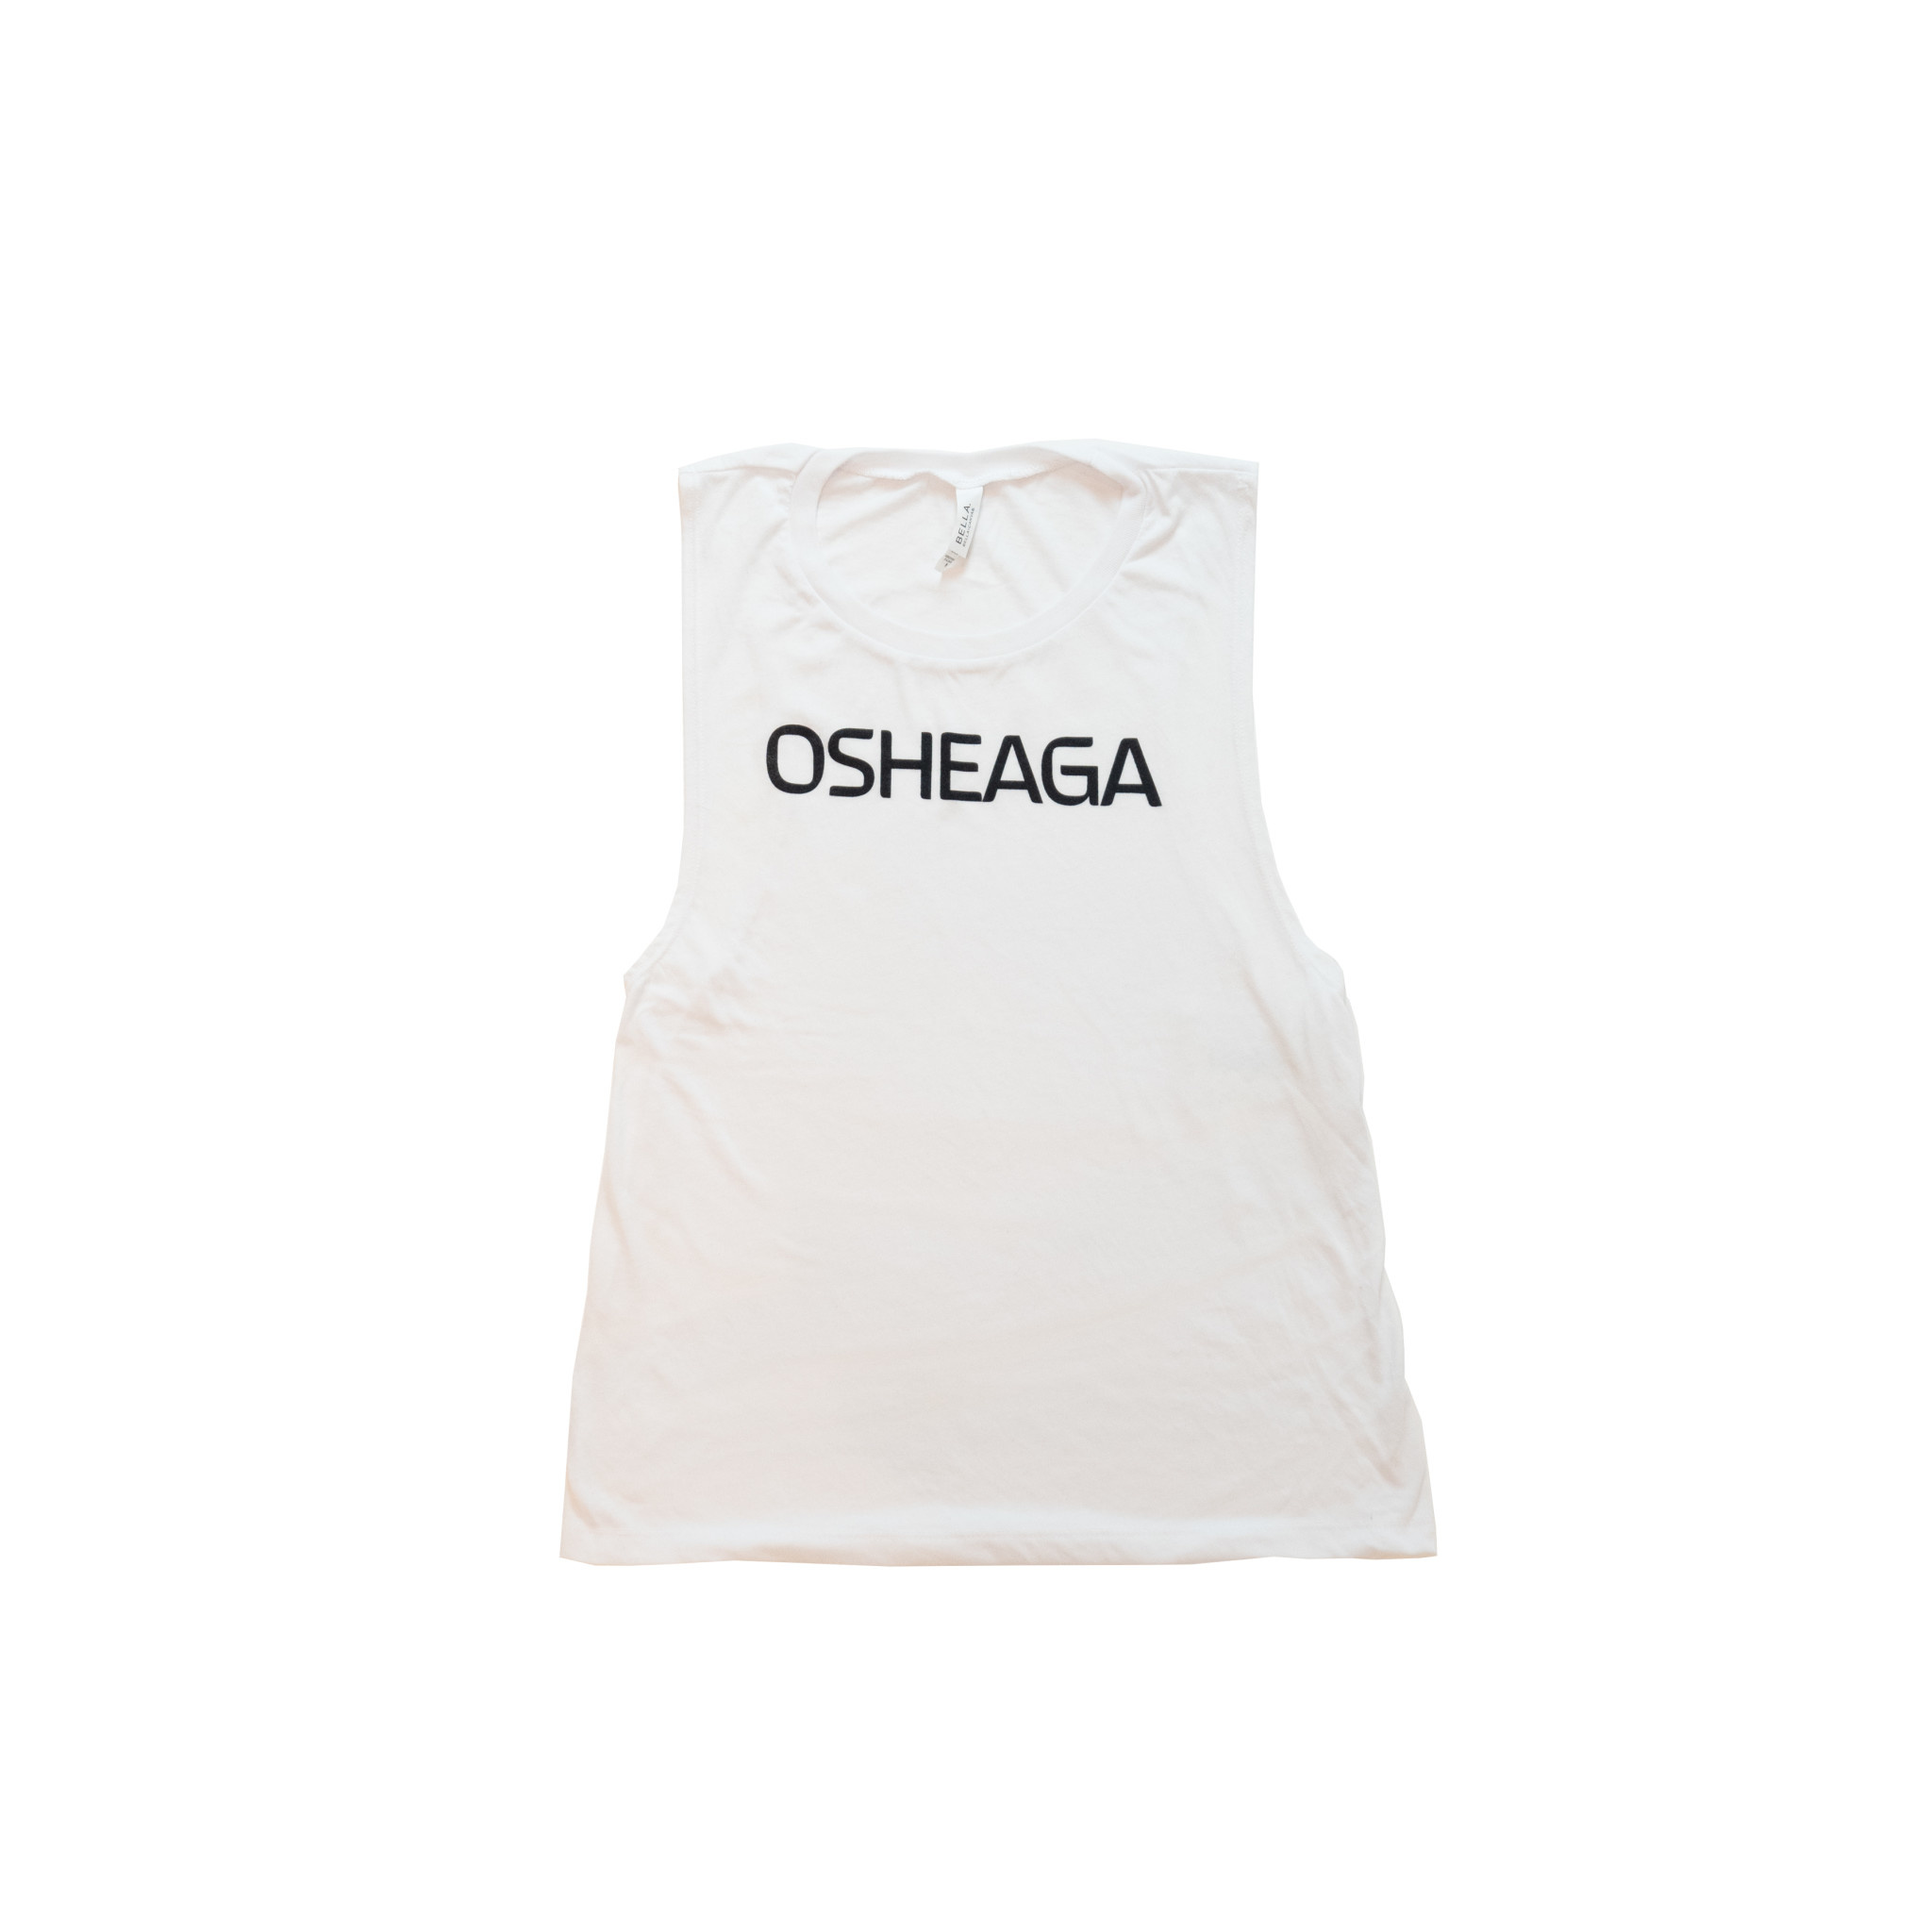 Osheaga Camisole Femme Musique et Art Blanche